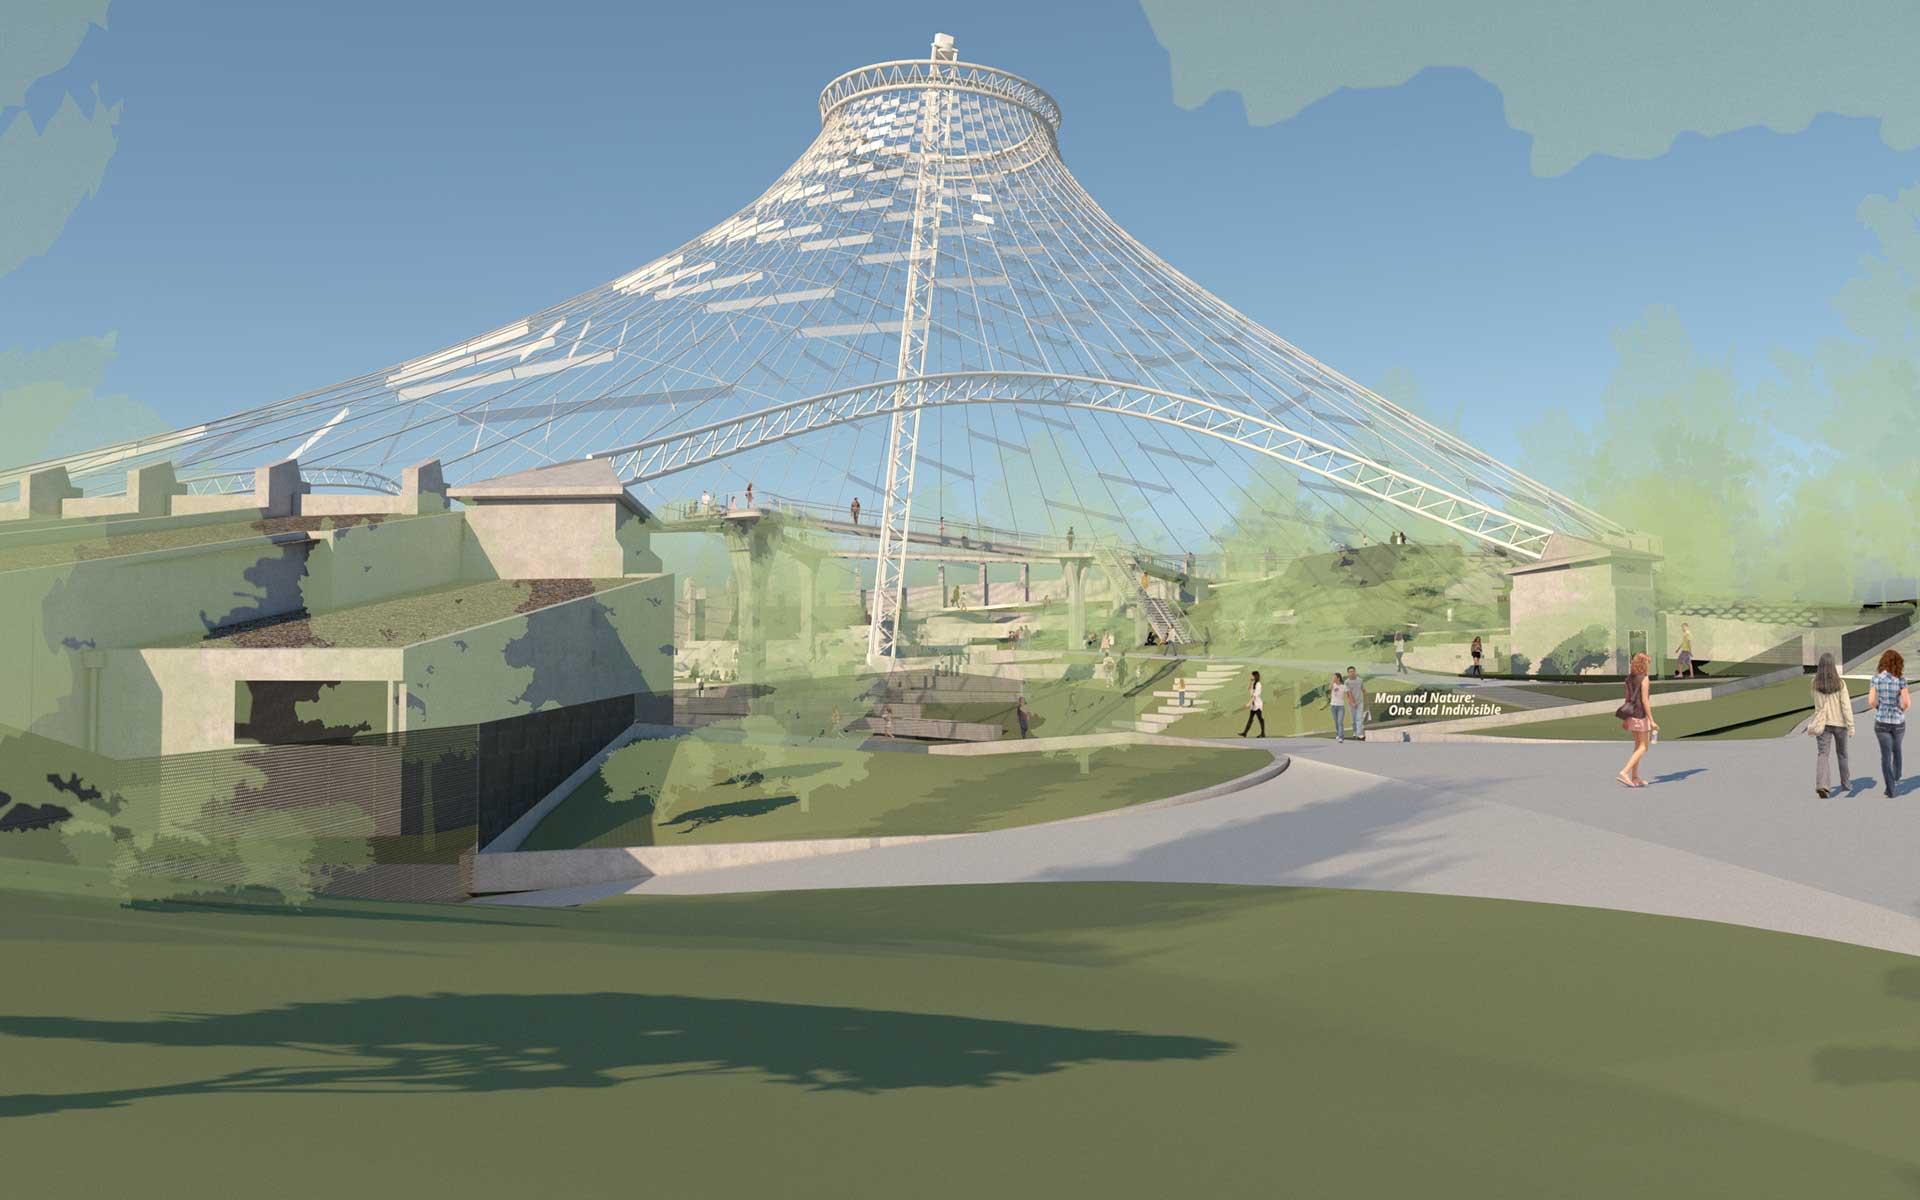 U S  Pavilion & Event Shelters - City of Spokane, Washington